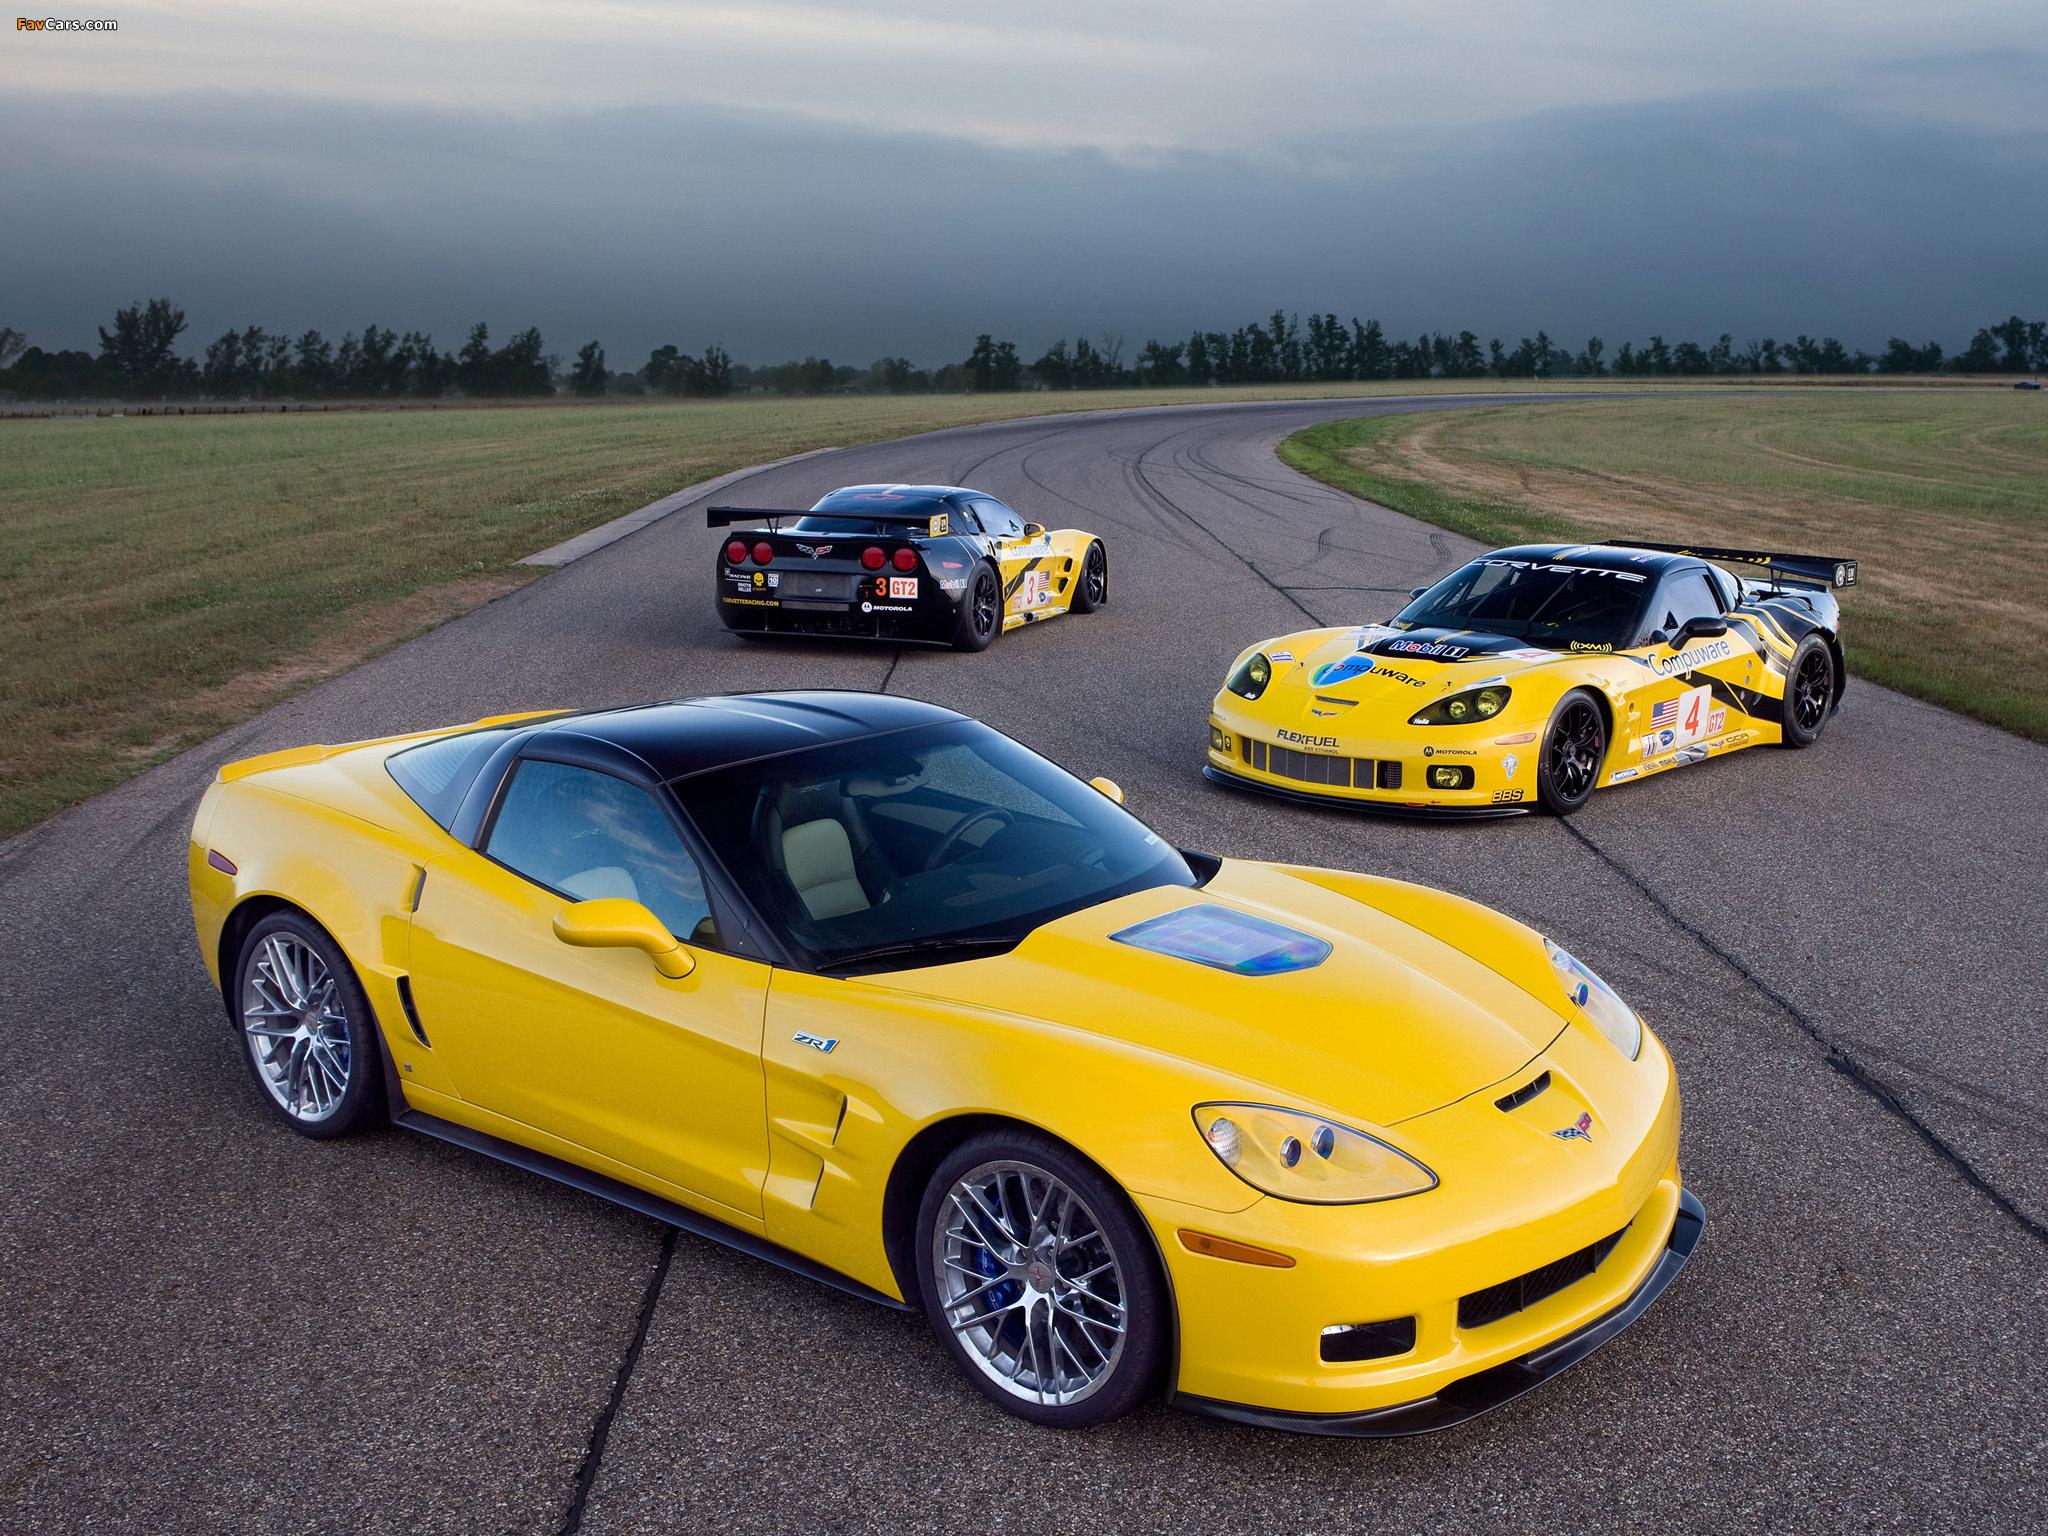 Pictures of Corvette (2048 x 1536)